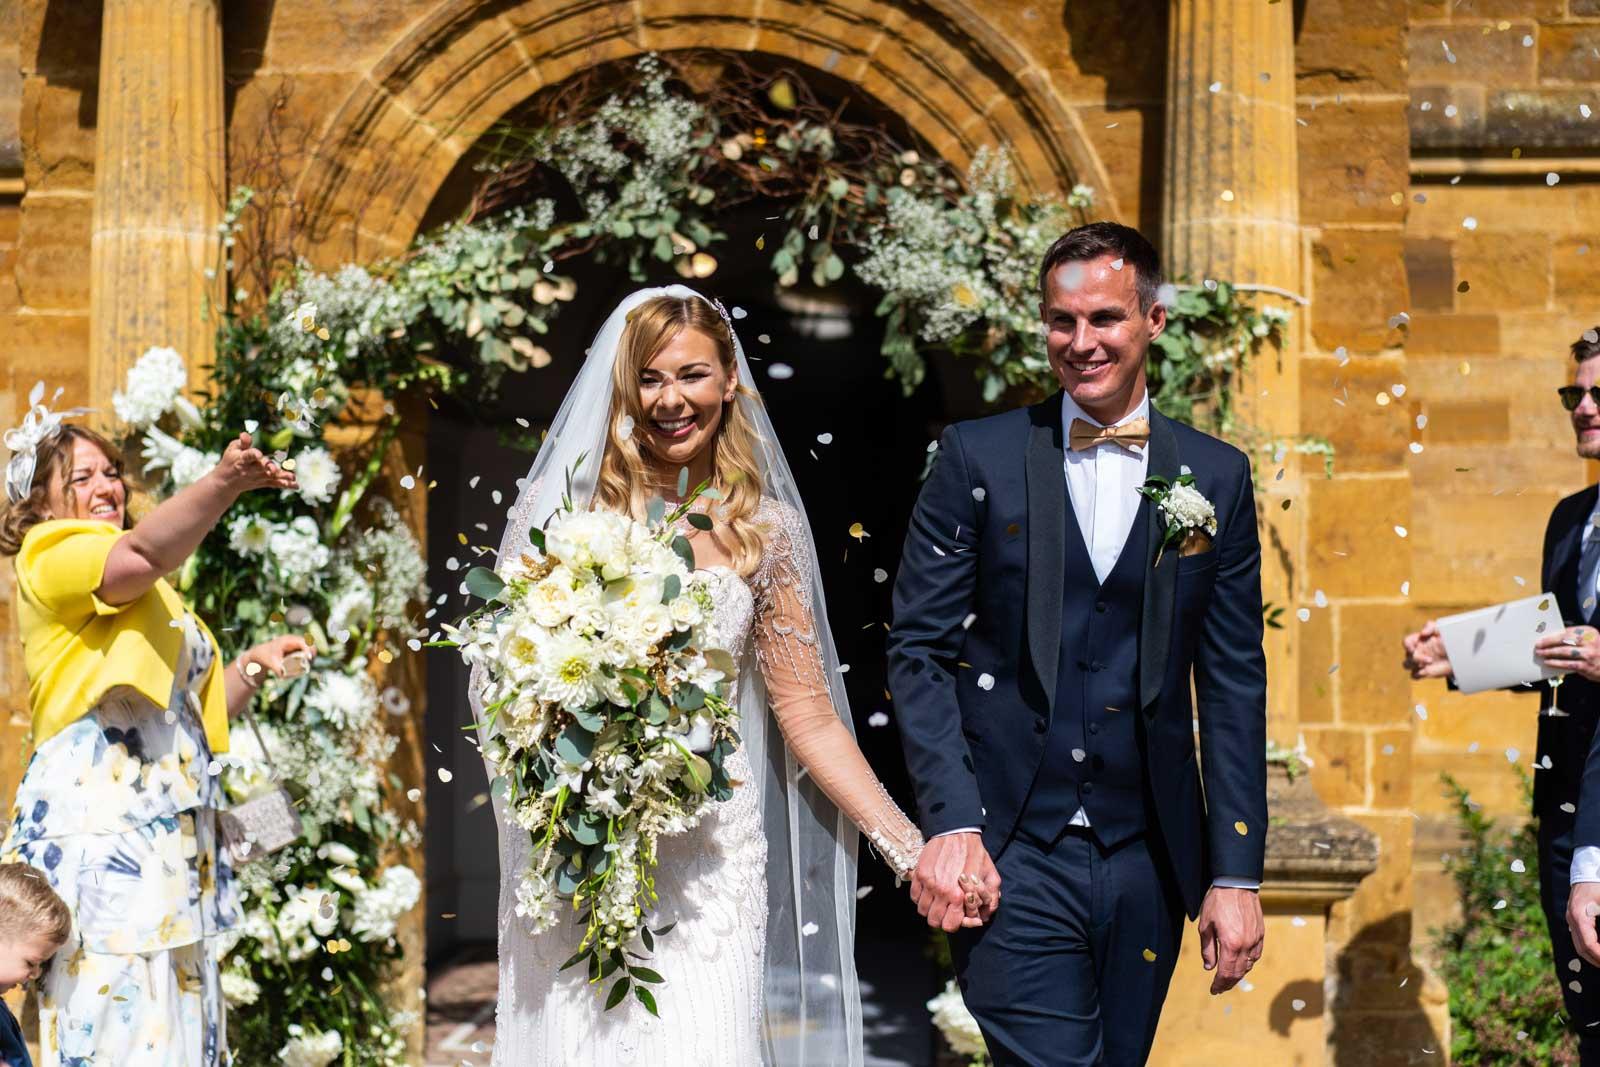 Delapre Abbey wedding photographer